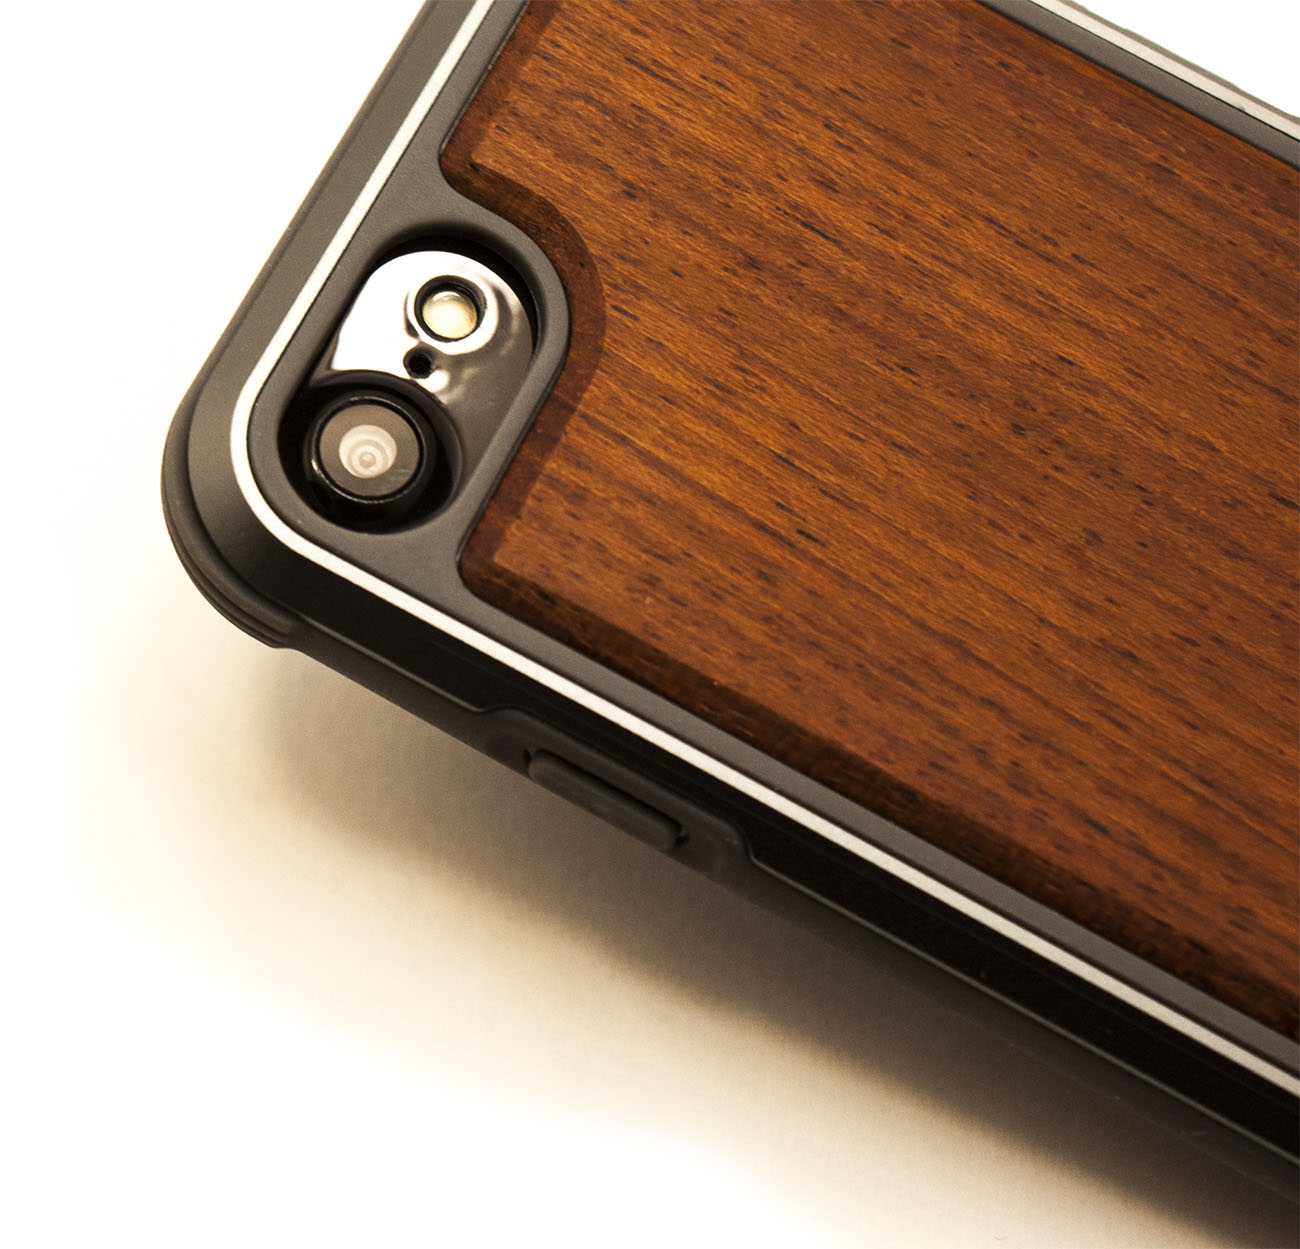 X-Doria defense lux wood